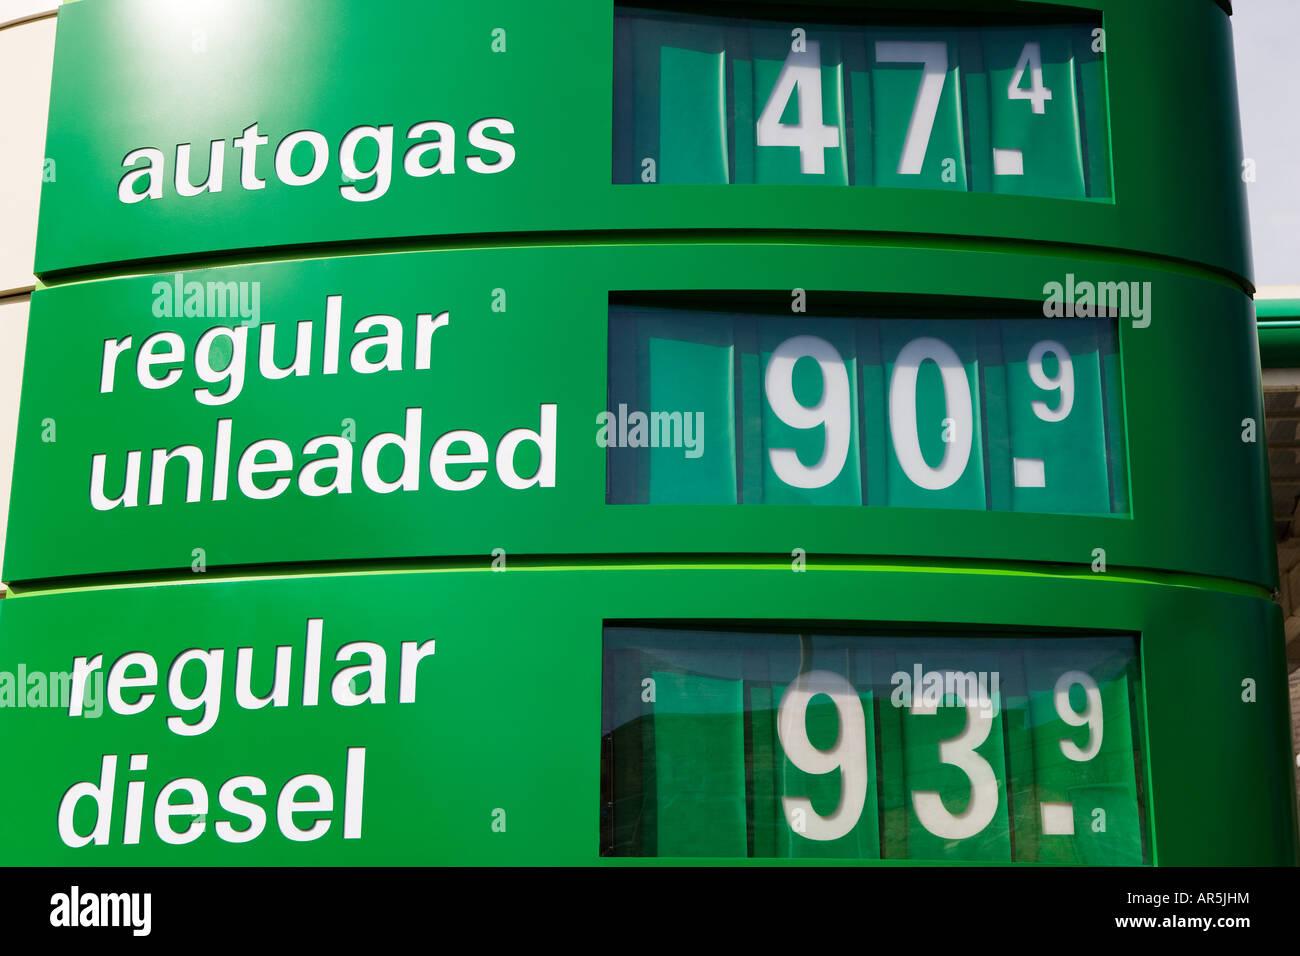 Petrol prices - Stock Image